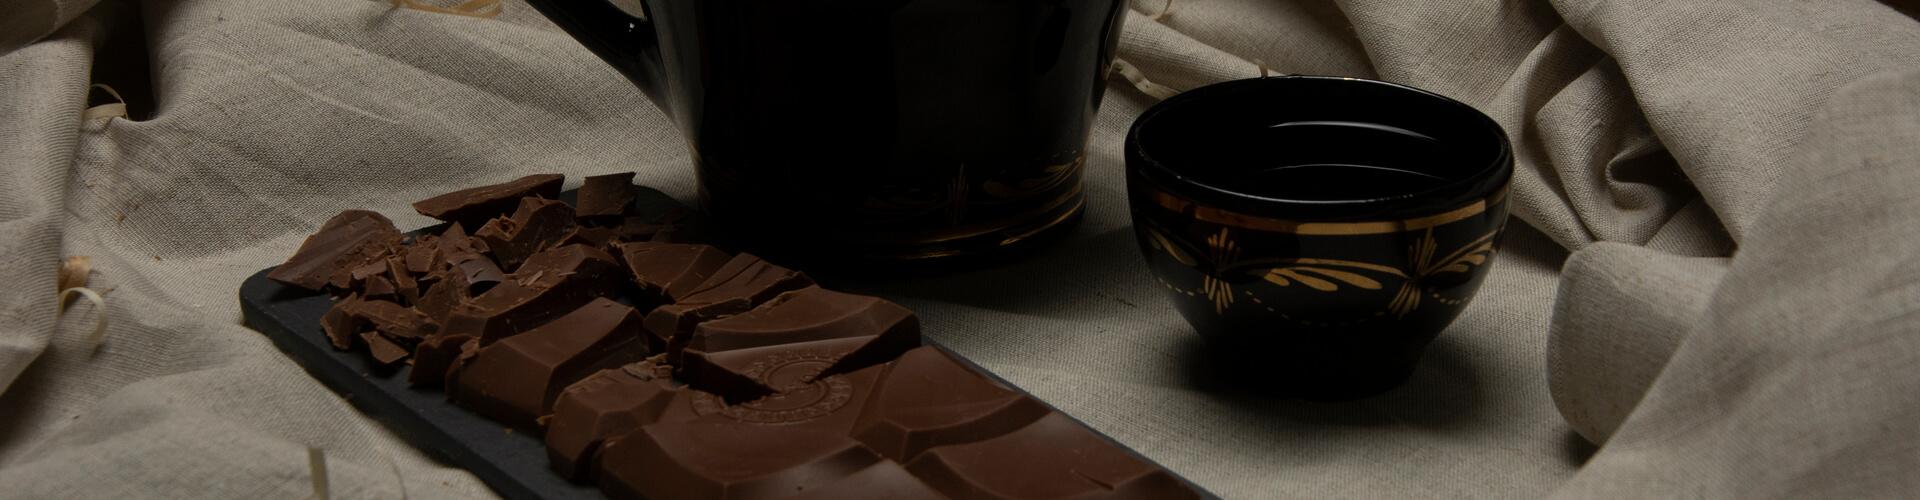 <strong>Шоколадная мануфактура</strong> Bean to Bar <br />